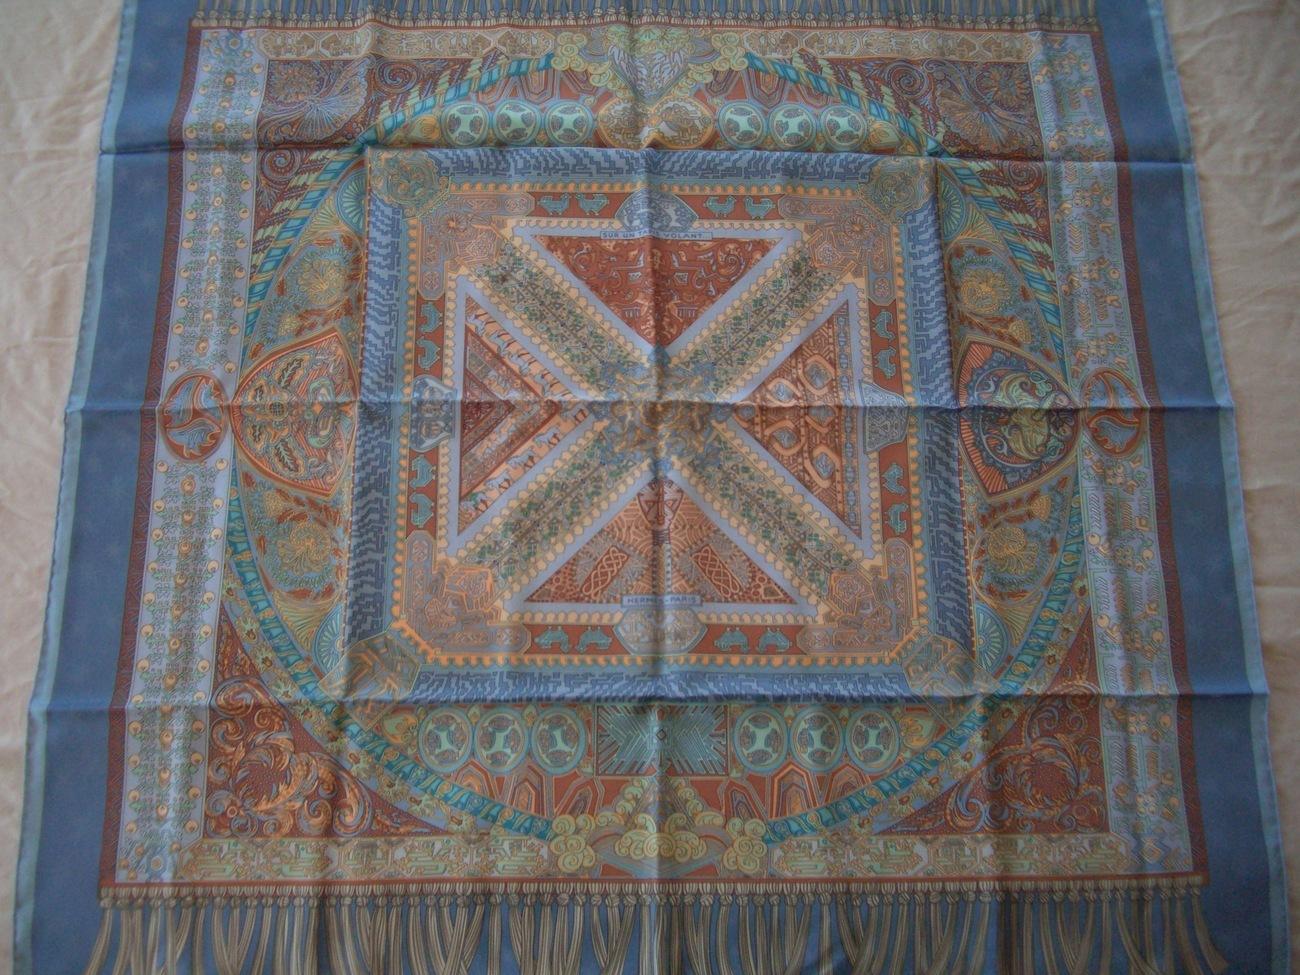 hermes scarf sur un tapis volant blue silk. Black Bedroom Furniture Sets. Home Design Ideas